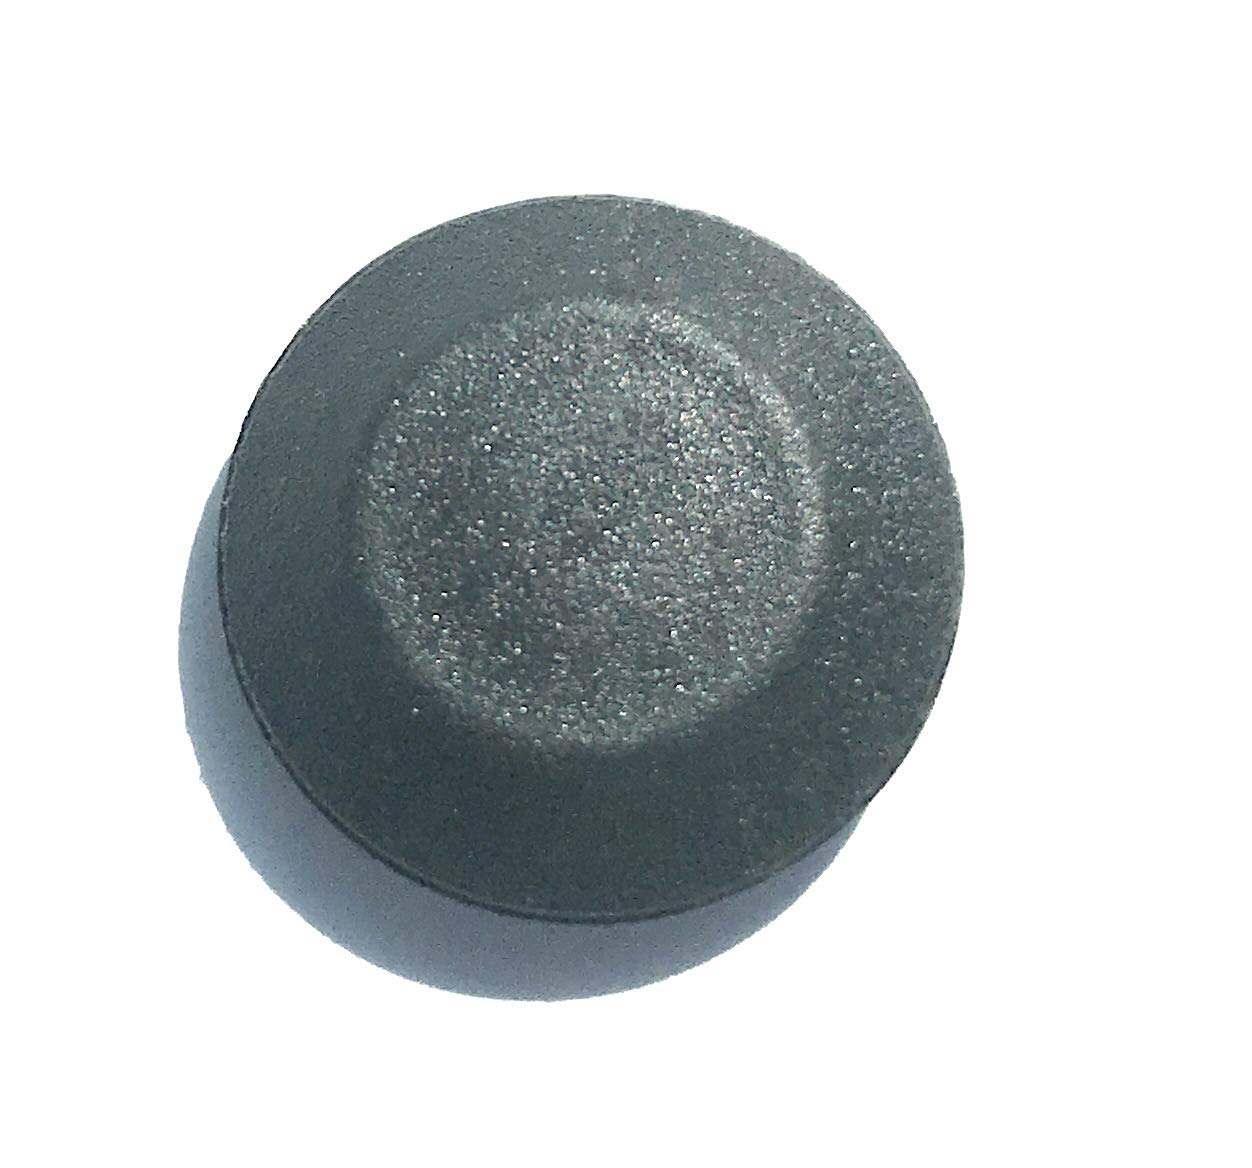 10 Flush Sheet Metal Hole Plugs 2-1//2 Black Clipsandfasteners Inc